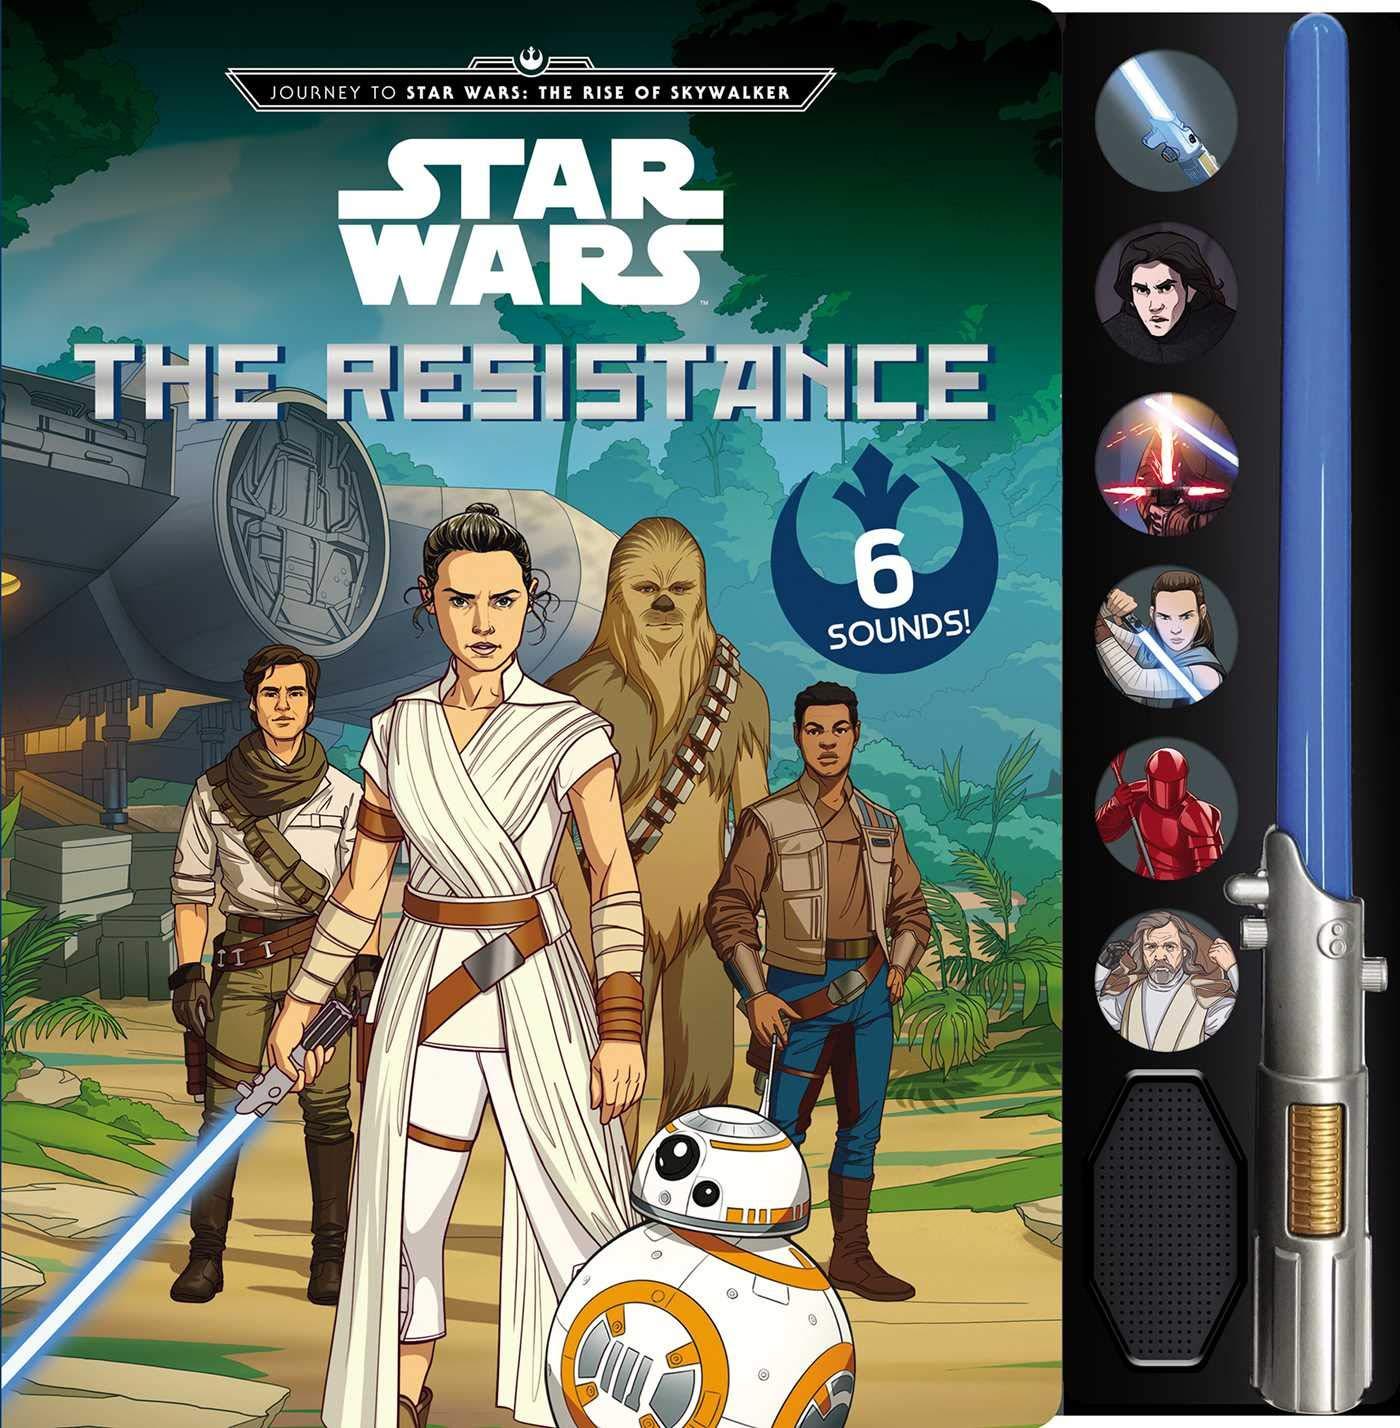 Journey To Star Wars The Rise Of Skywalker The Resistance Lightsaber Sound Books Editors Of Studio Fun International 9780794444211 Amazon Com Books